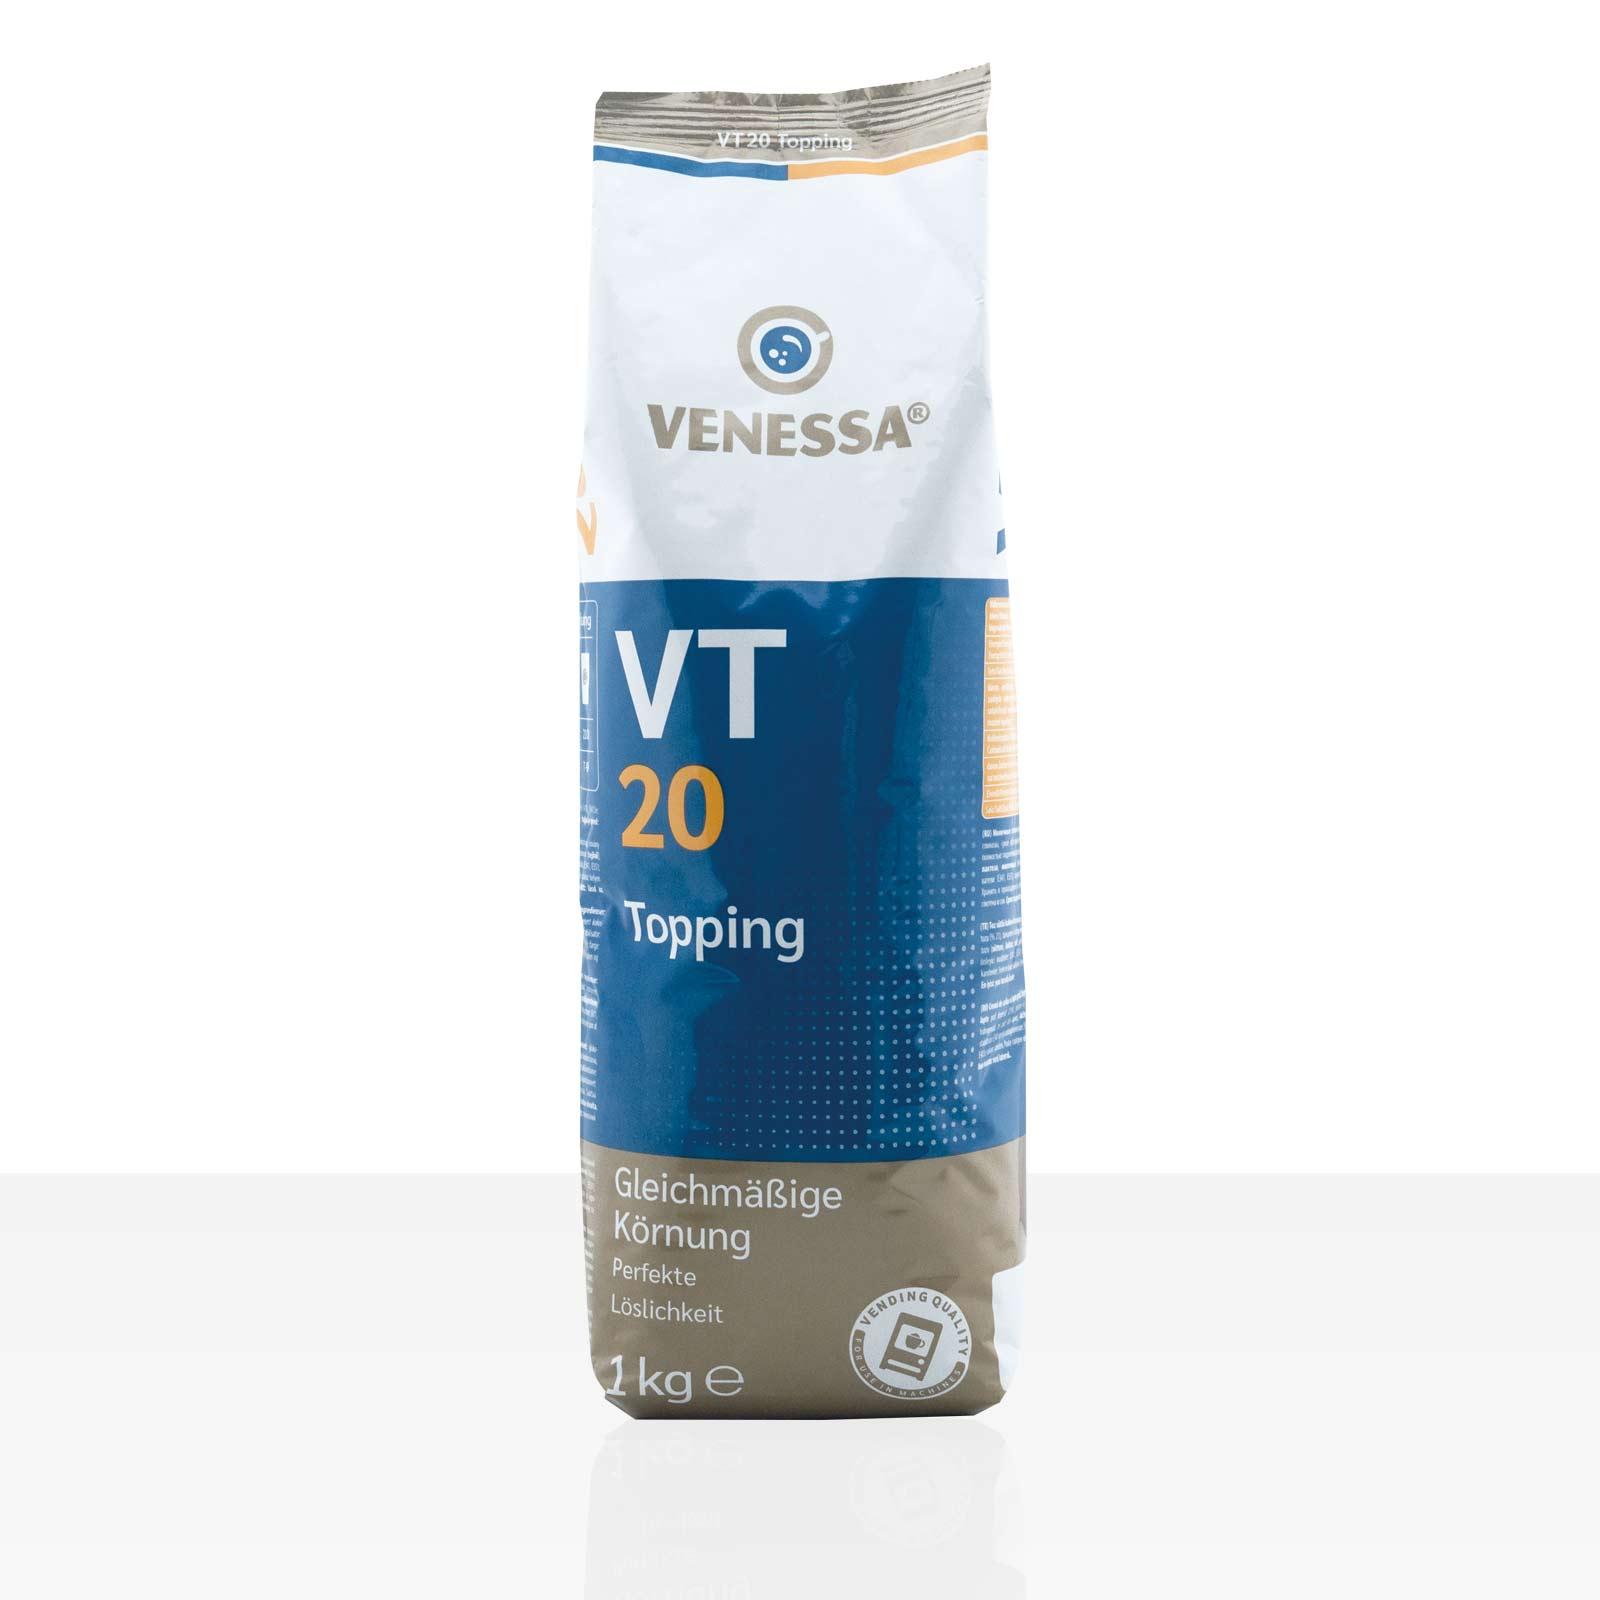 Venessa VT 20 Topping 1kg Milchpulver